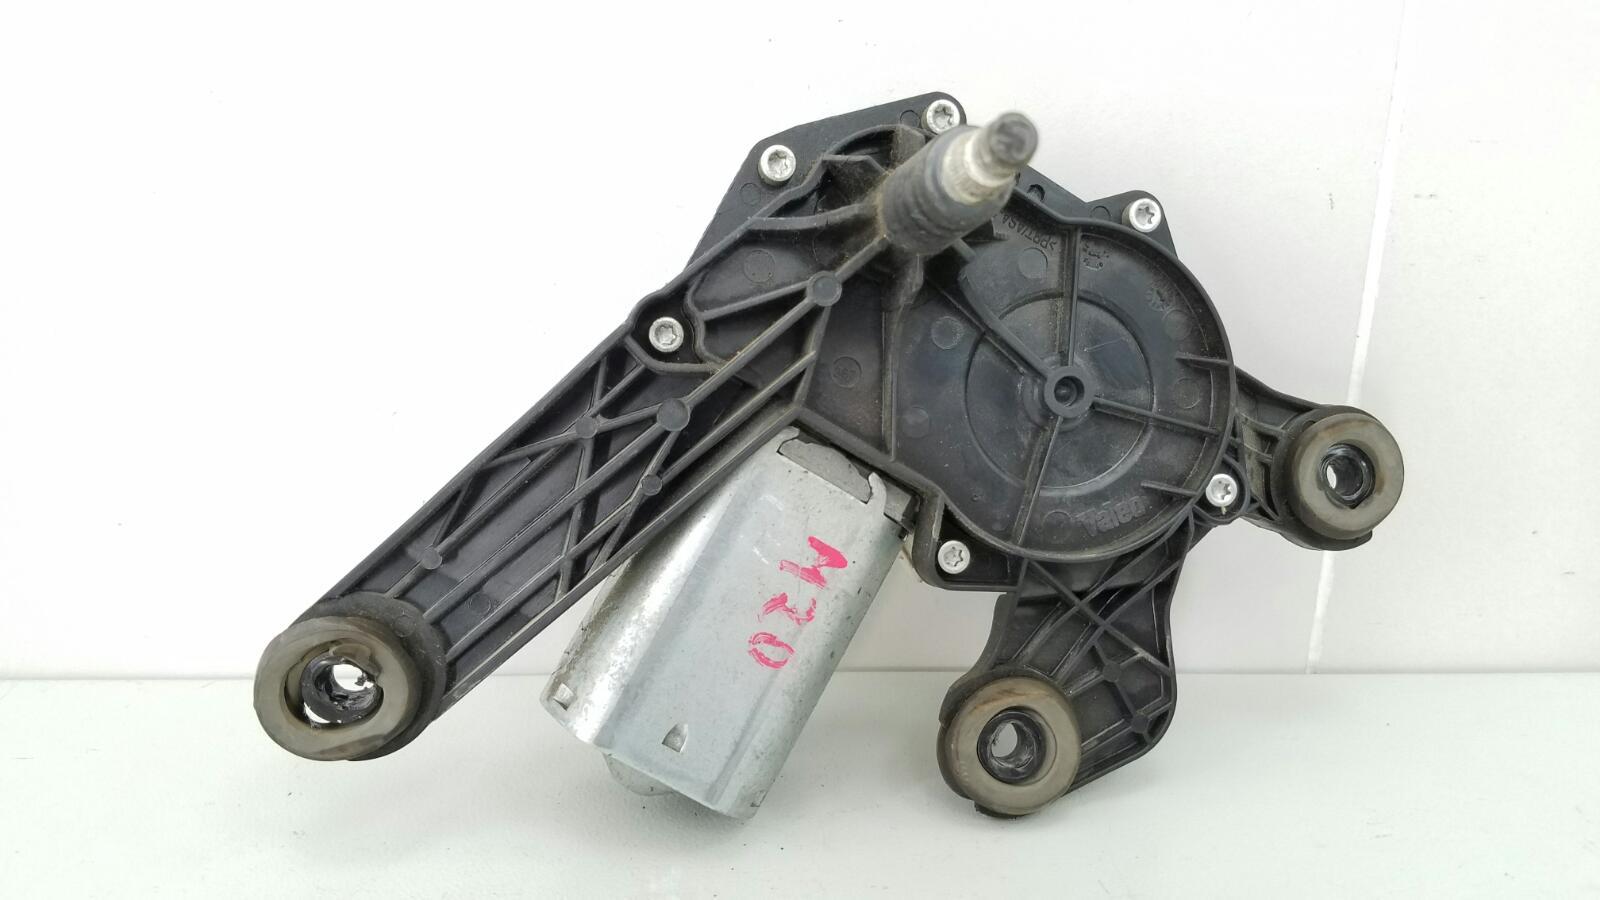 Моторчик заднего дворника Citroen C4 LA NFU 2007